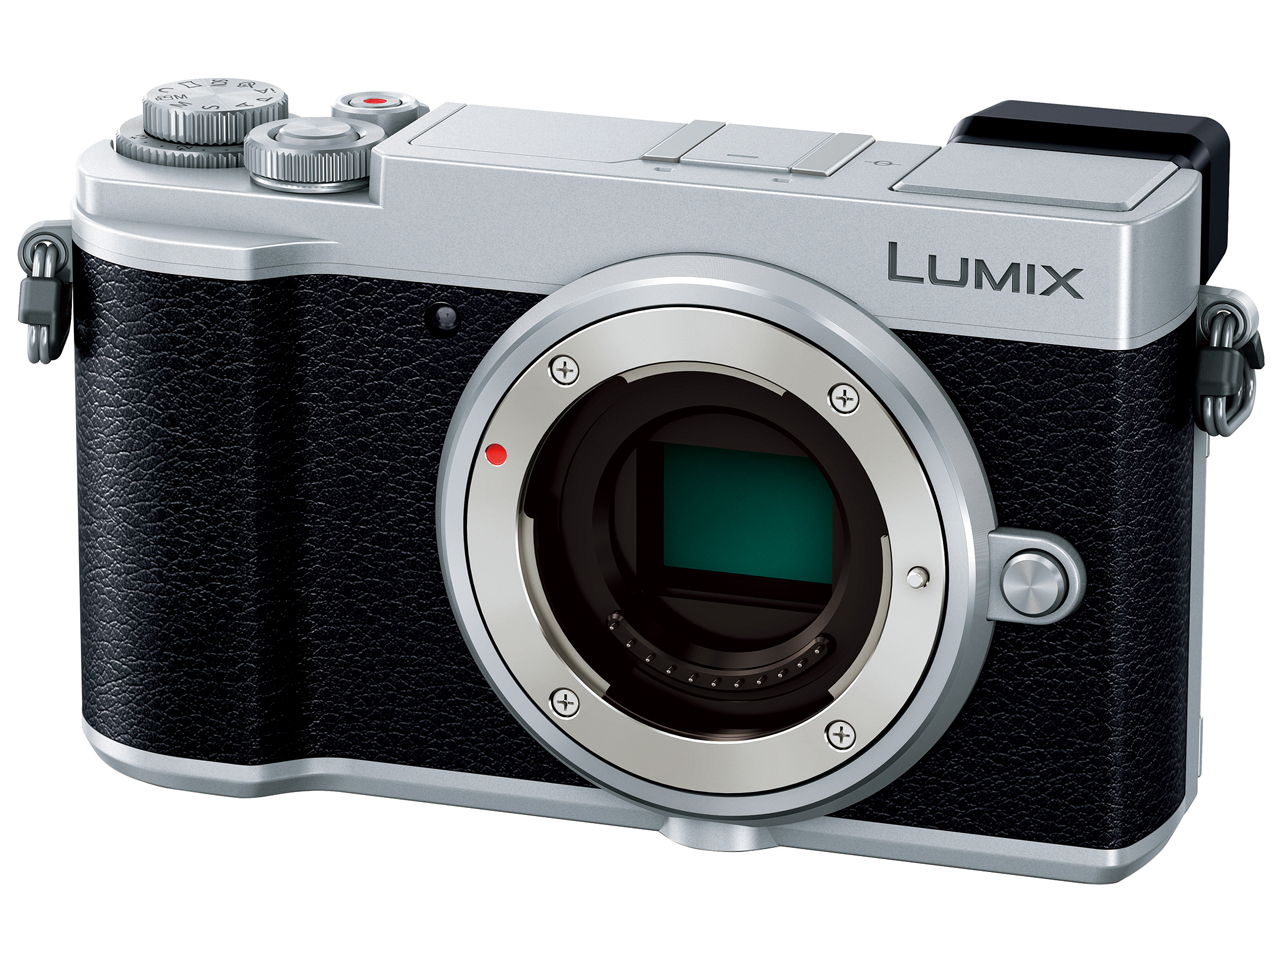 LUMIX DC-GX7MK3-S ボディ [シルバー] の製品画像